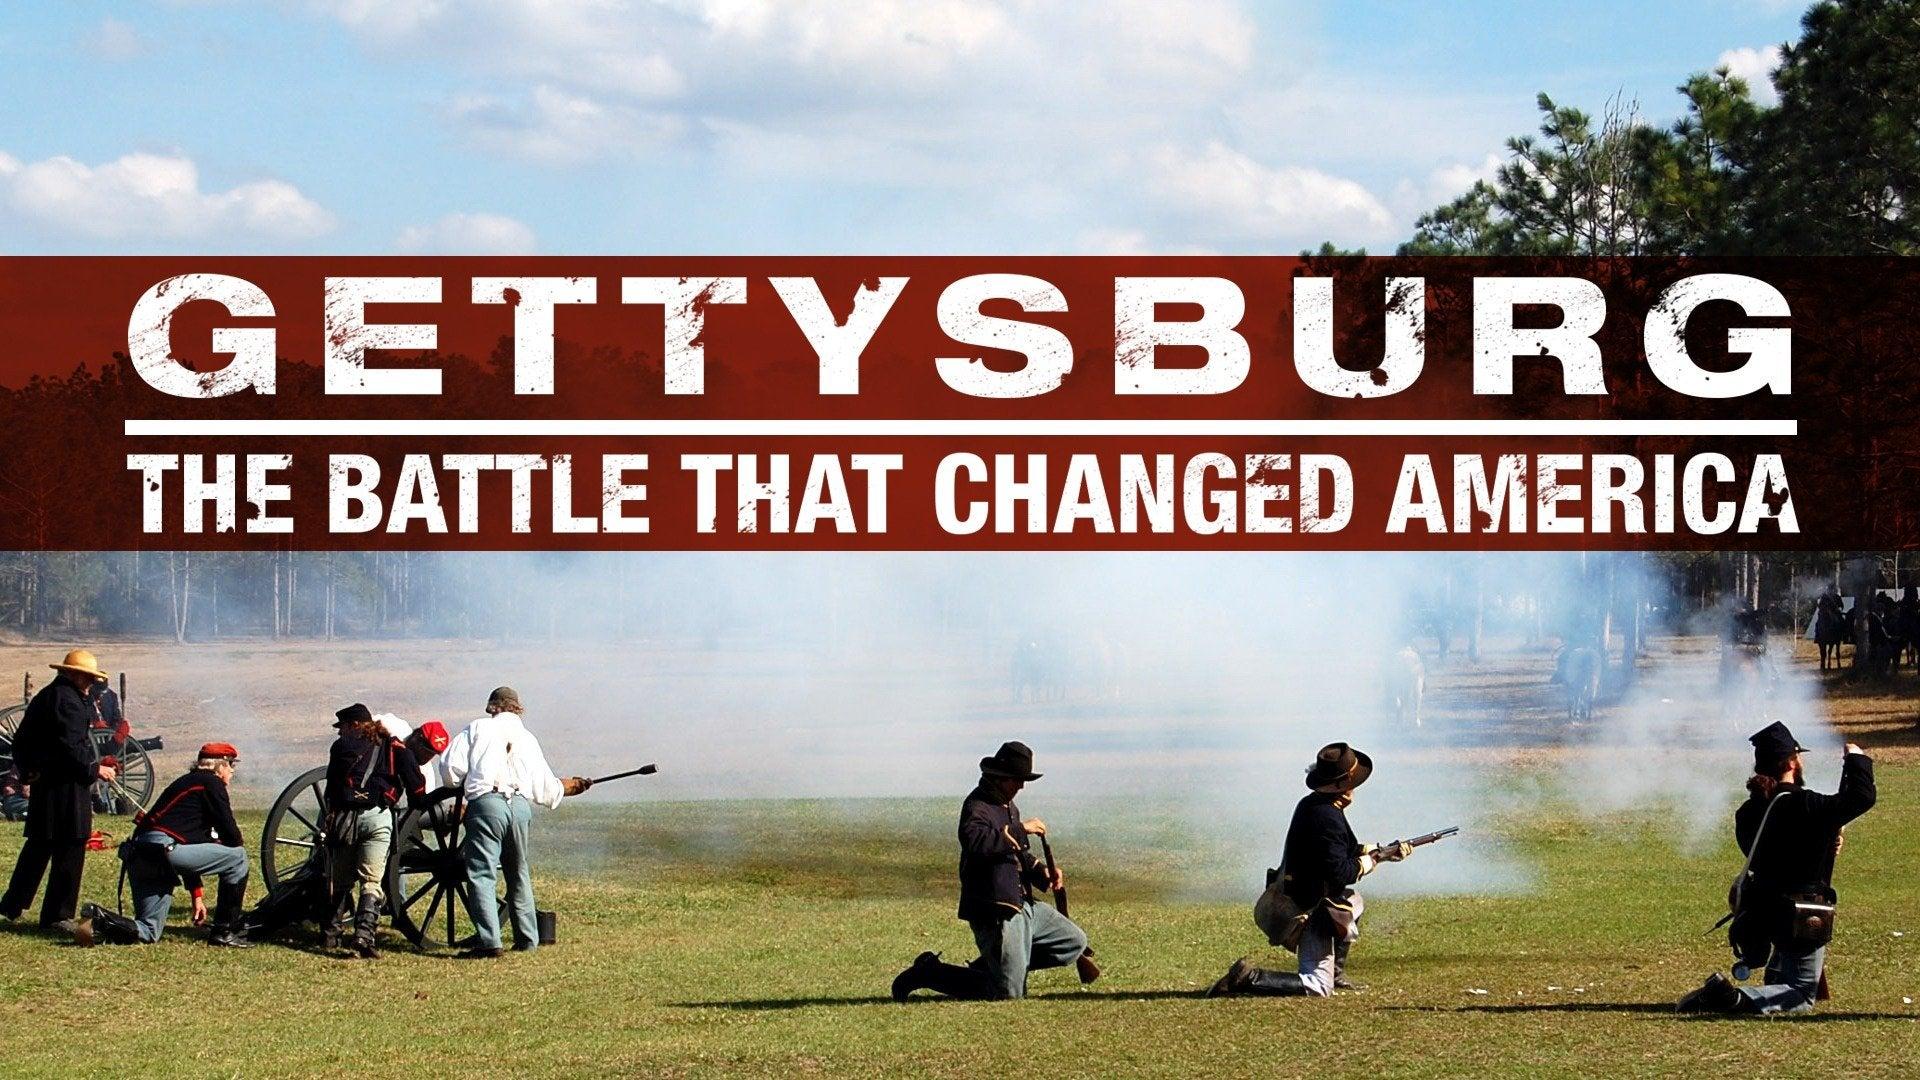 Gettysburg: The Battle That Changed America